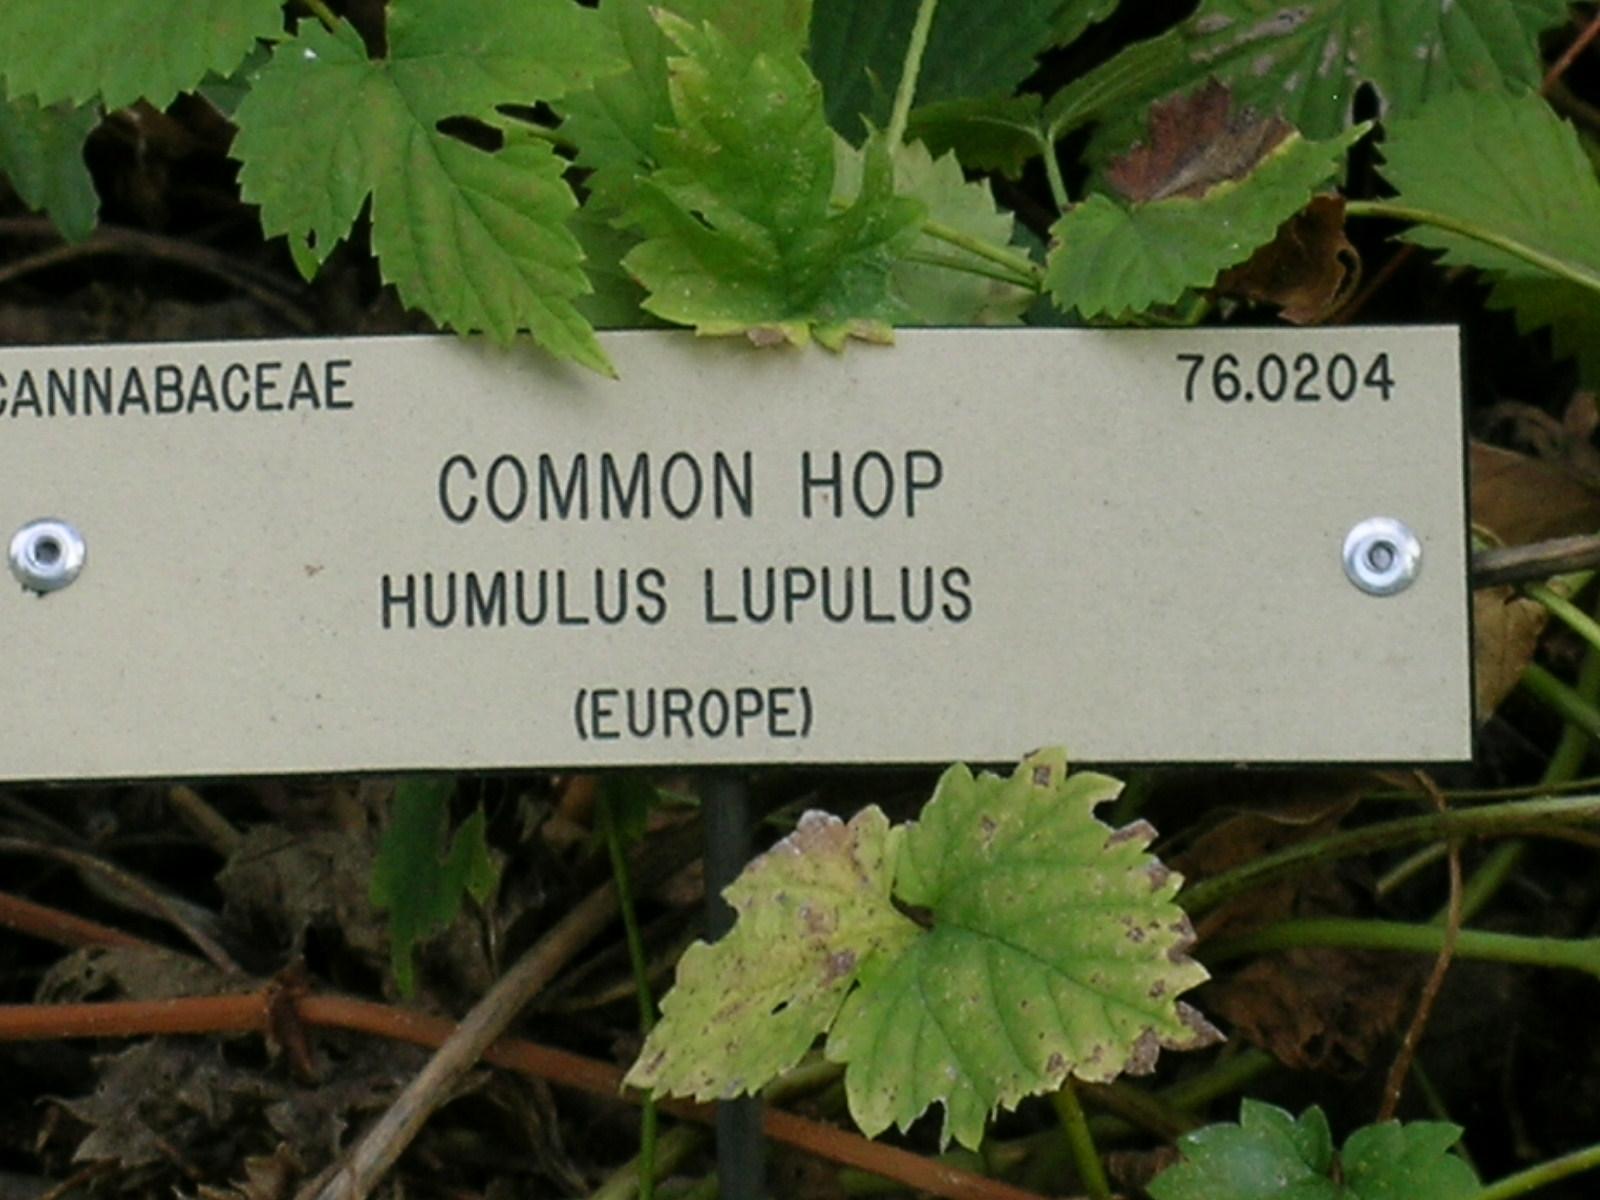 Berkeley Butterfly Blog: Humulus lupulus--Common Hop--Cannabaceae